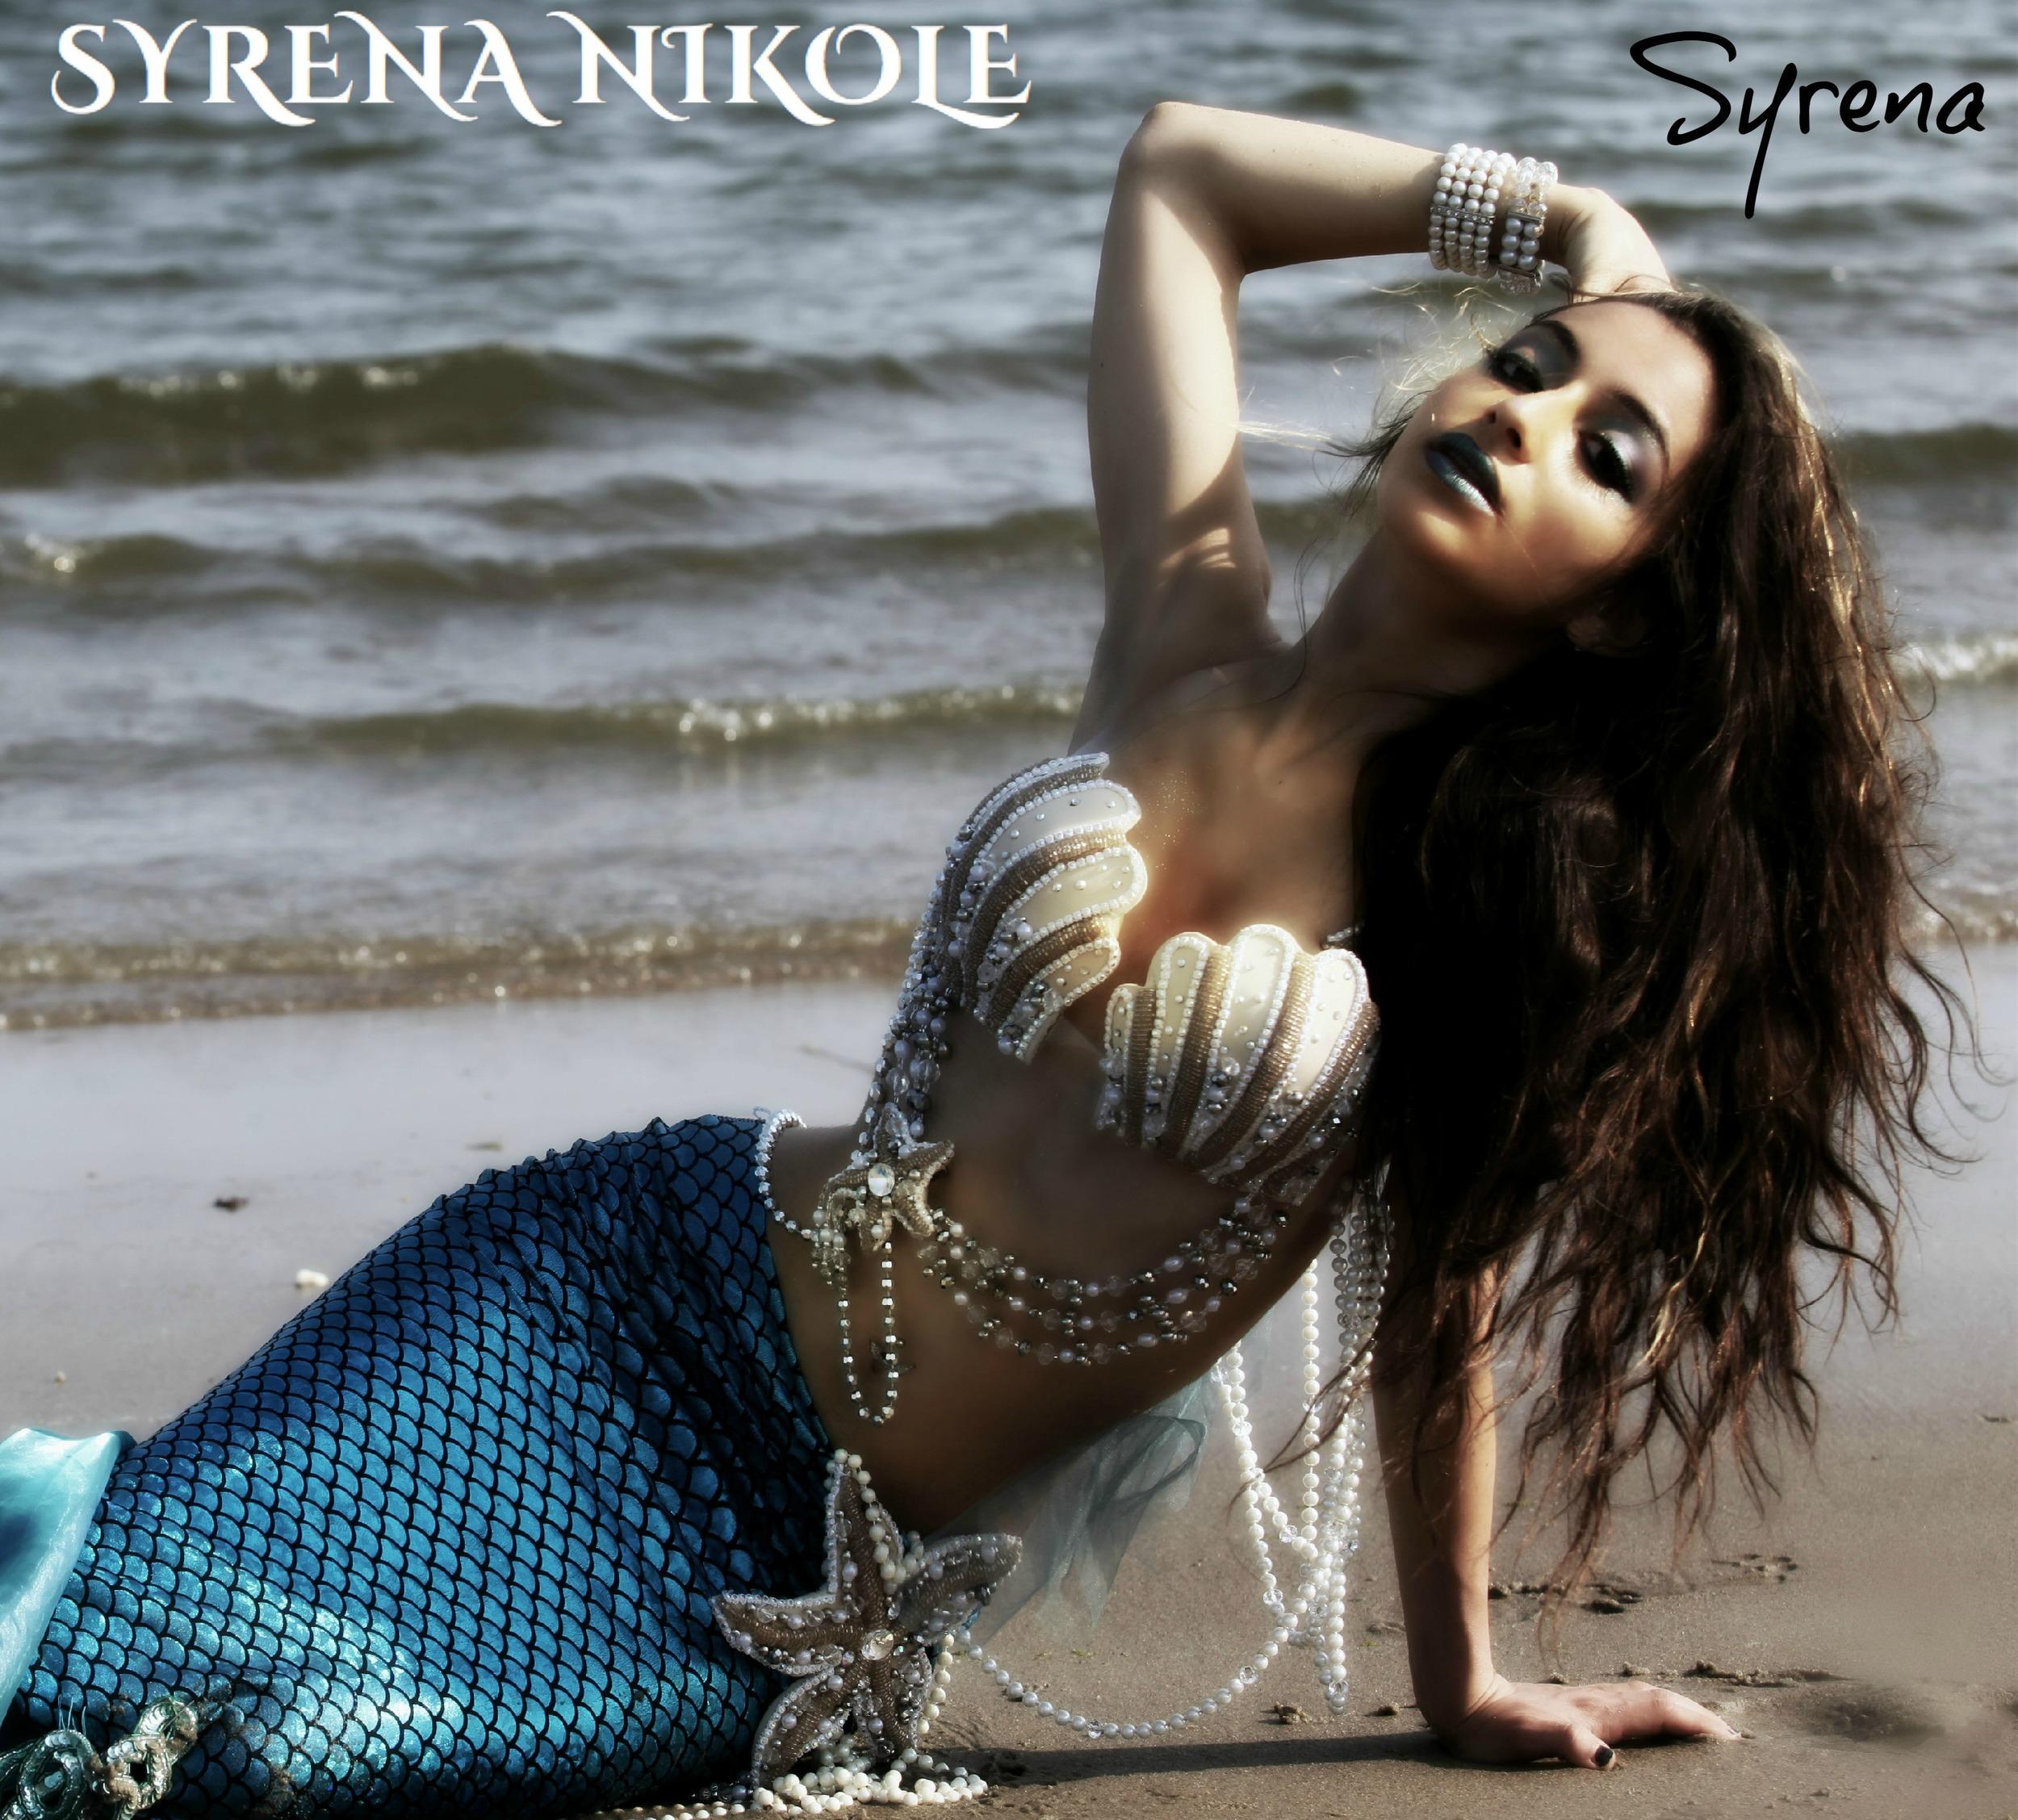 Syrena Mermaid Rock Star CD.jpg